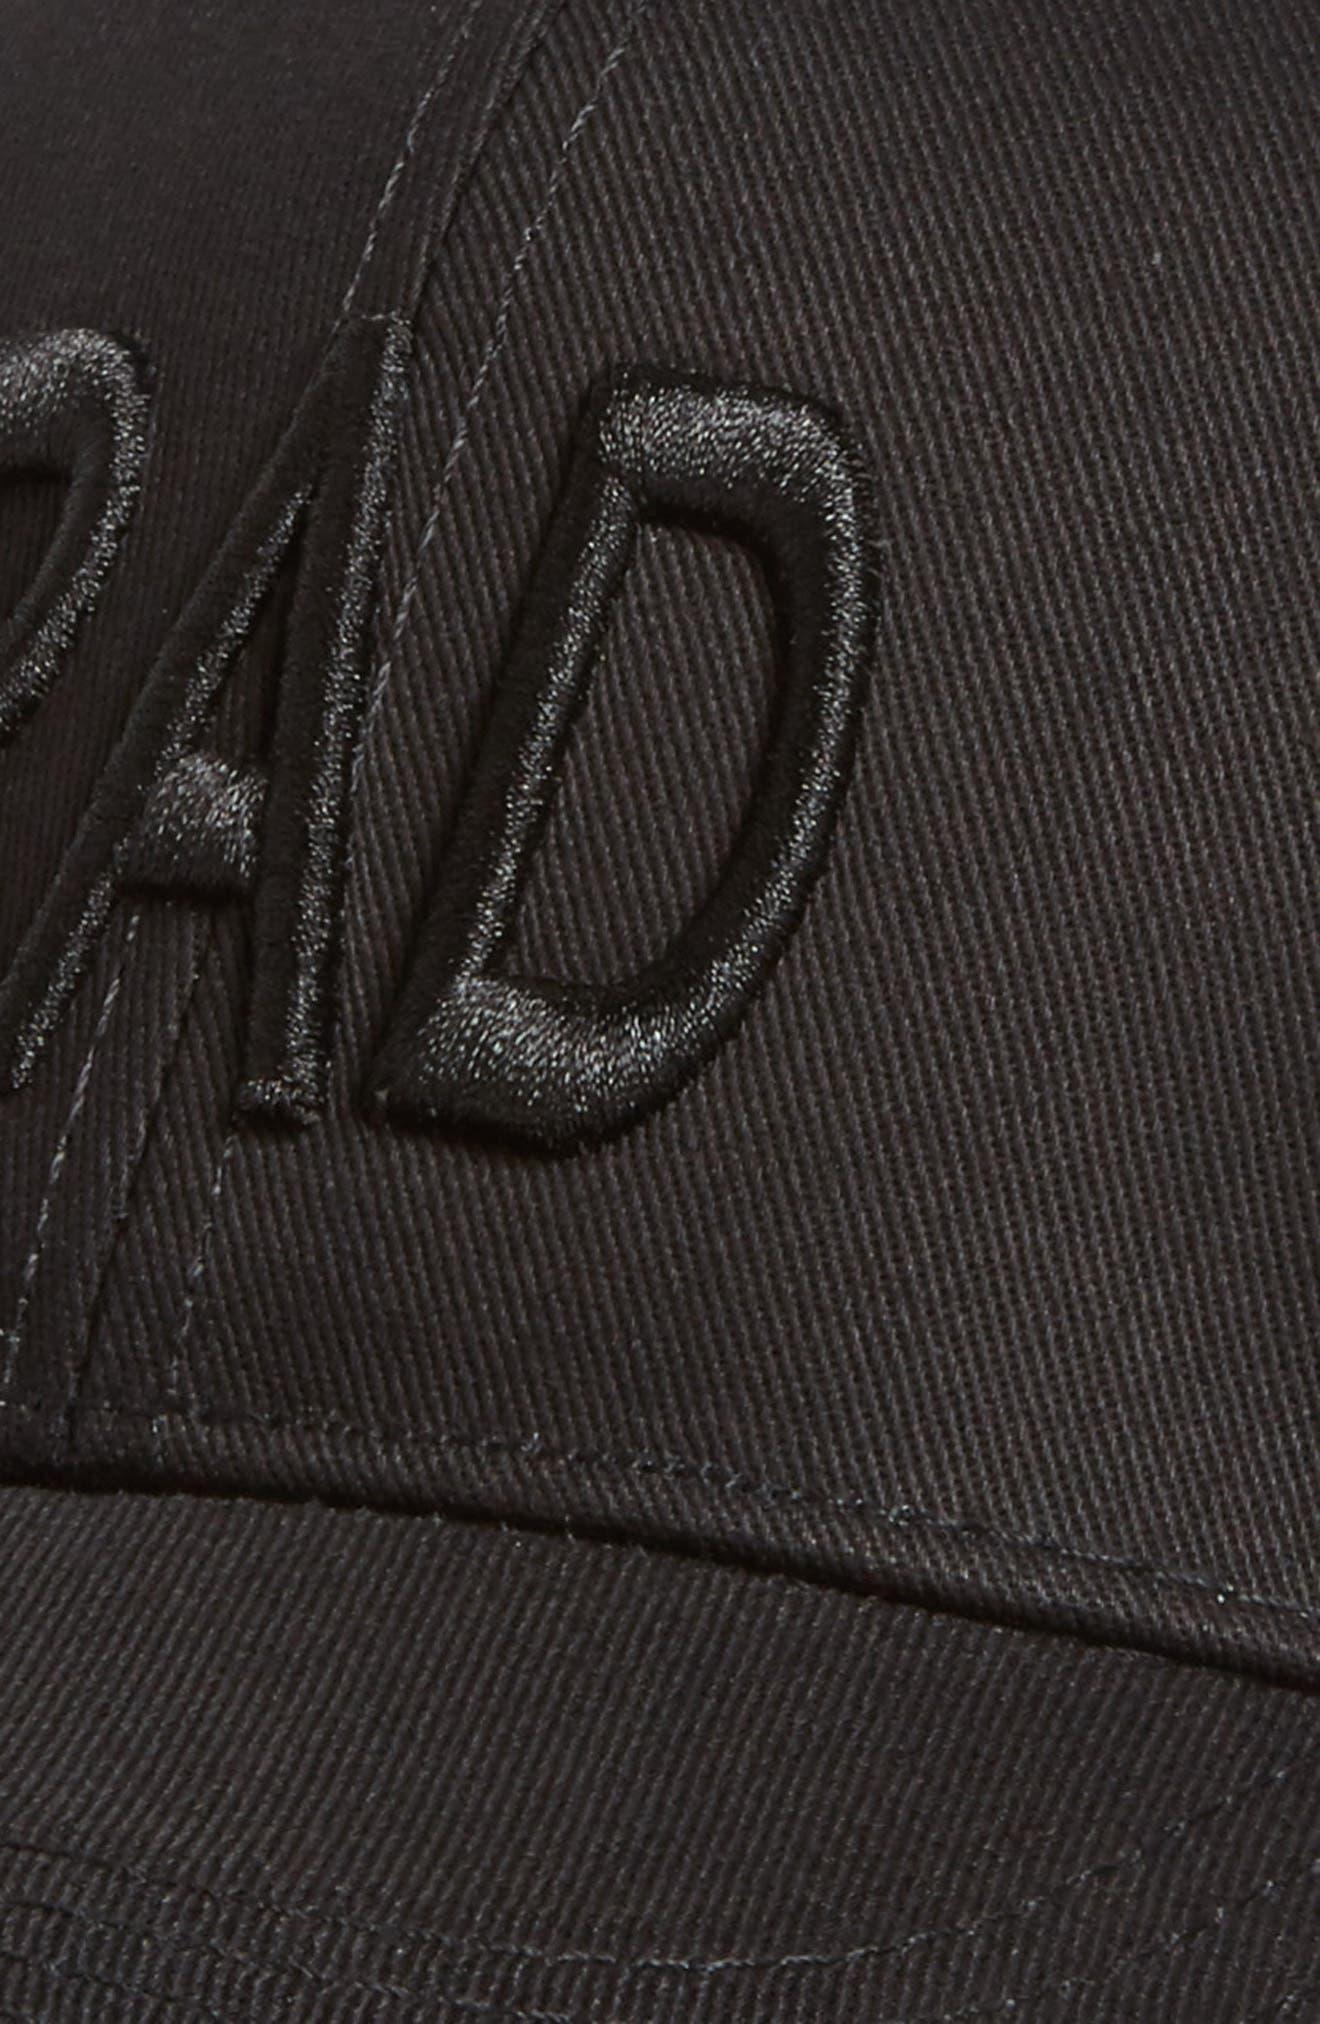 Alternate Image 3  - BP. Embroidered Ball Cap